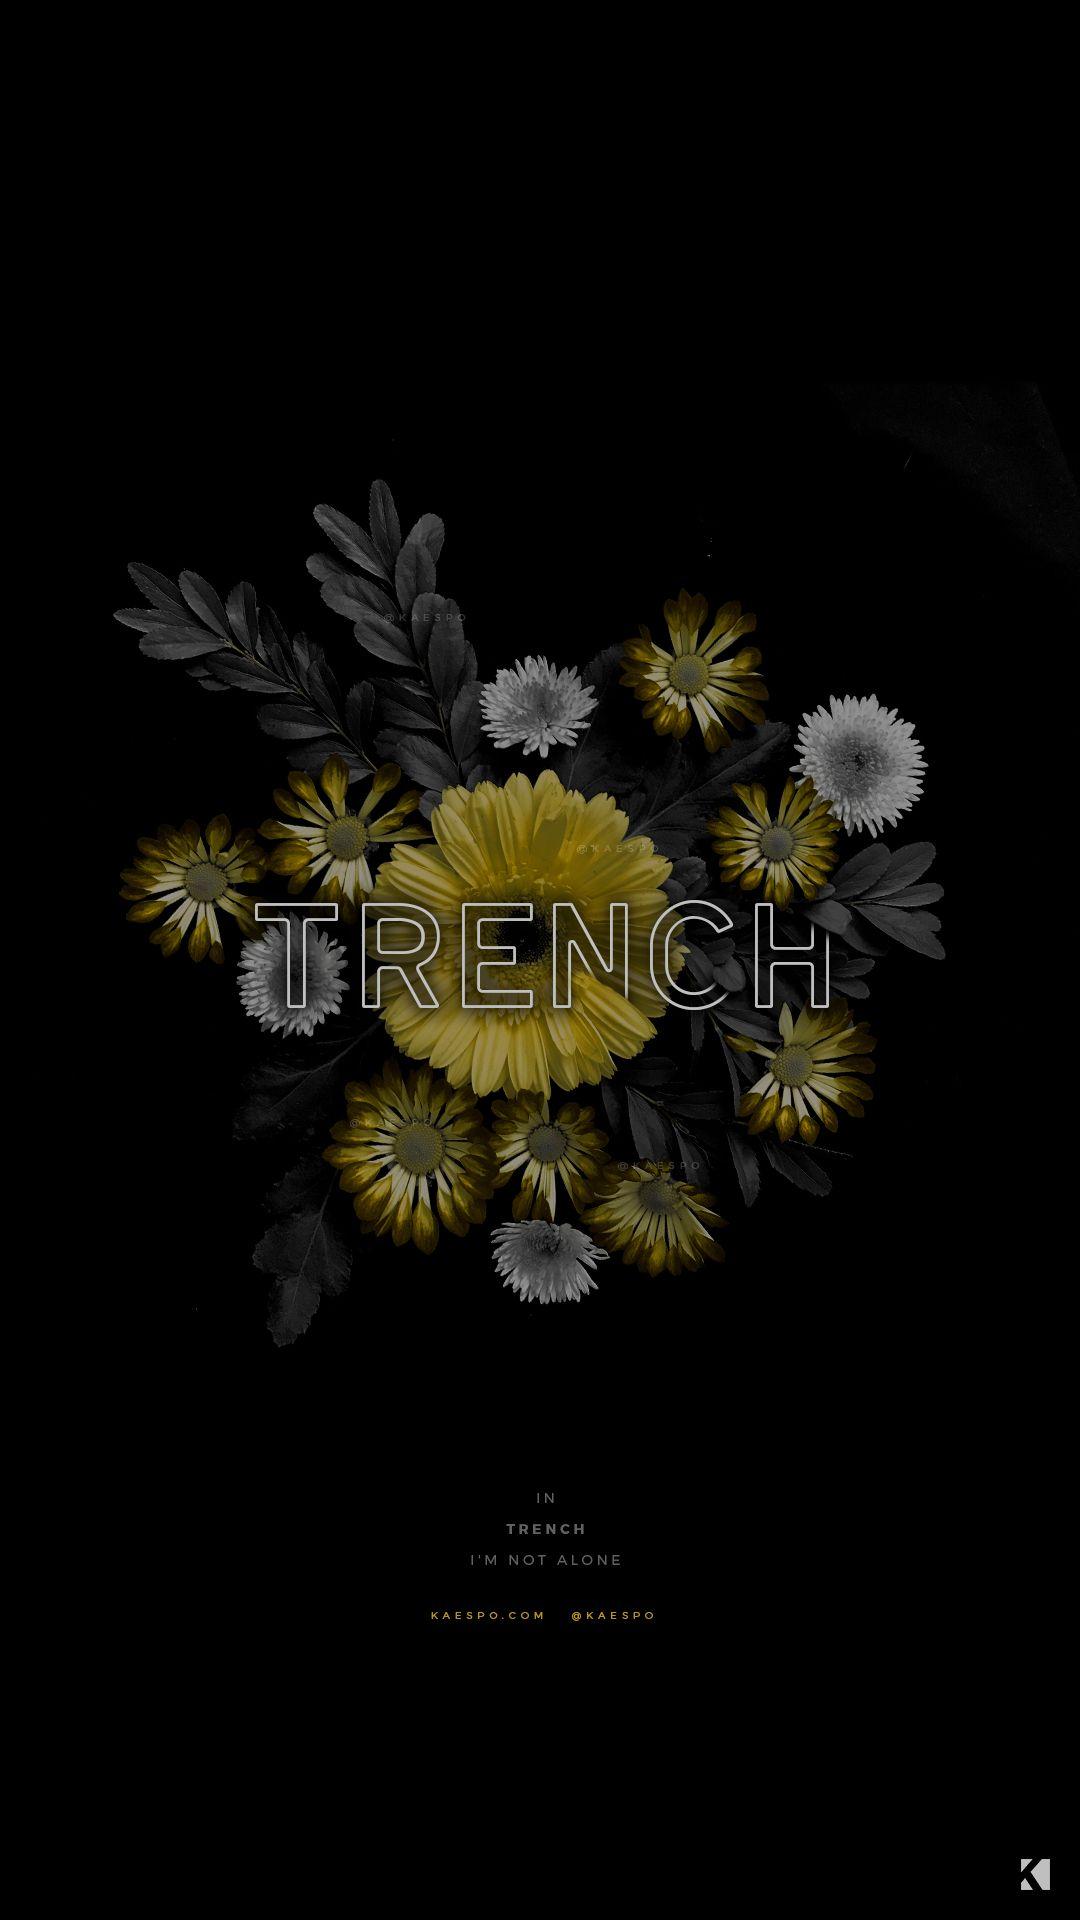 Wallpapers No 429 Trench Album Lyrics Yellow Floral Arrangements Kaespo Design Twenty One Pilots Wallpaper One Pilots Twenty One Pilots